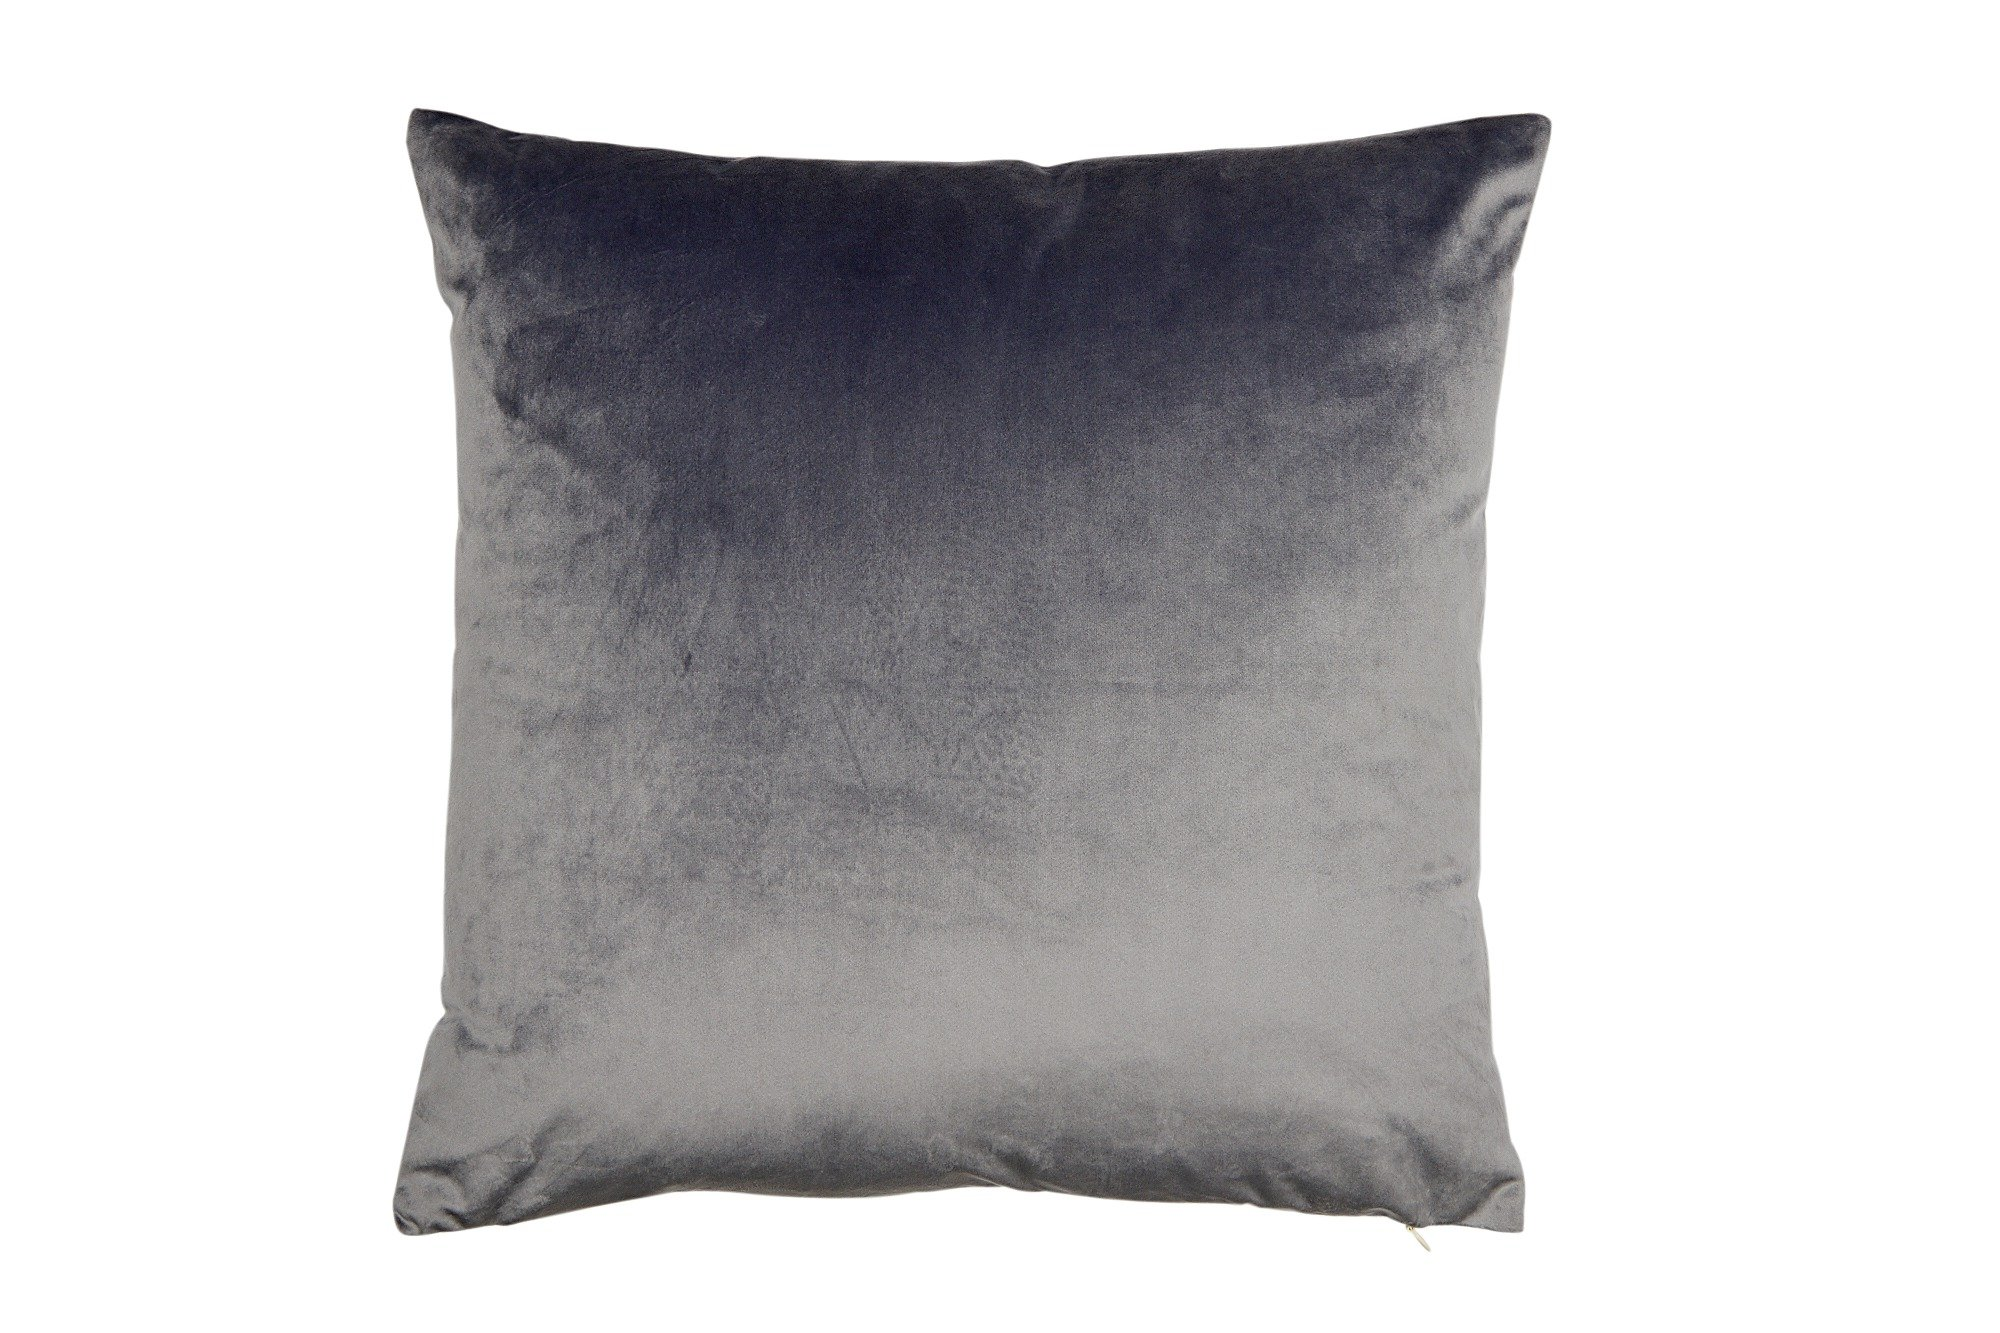 Heart of house origami cushion grey for Chair cushion covers argos